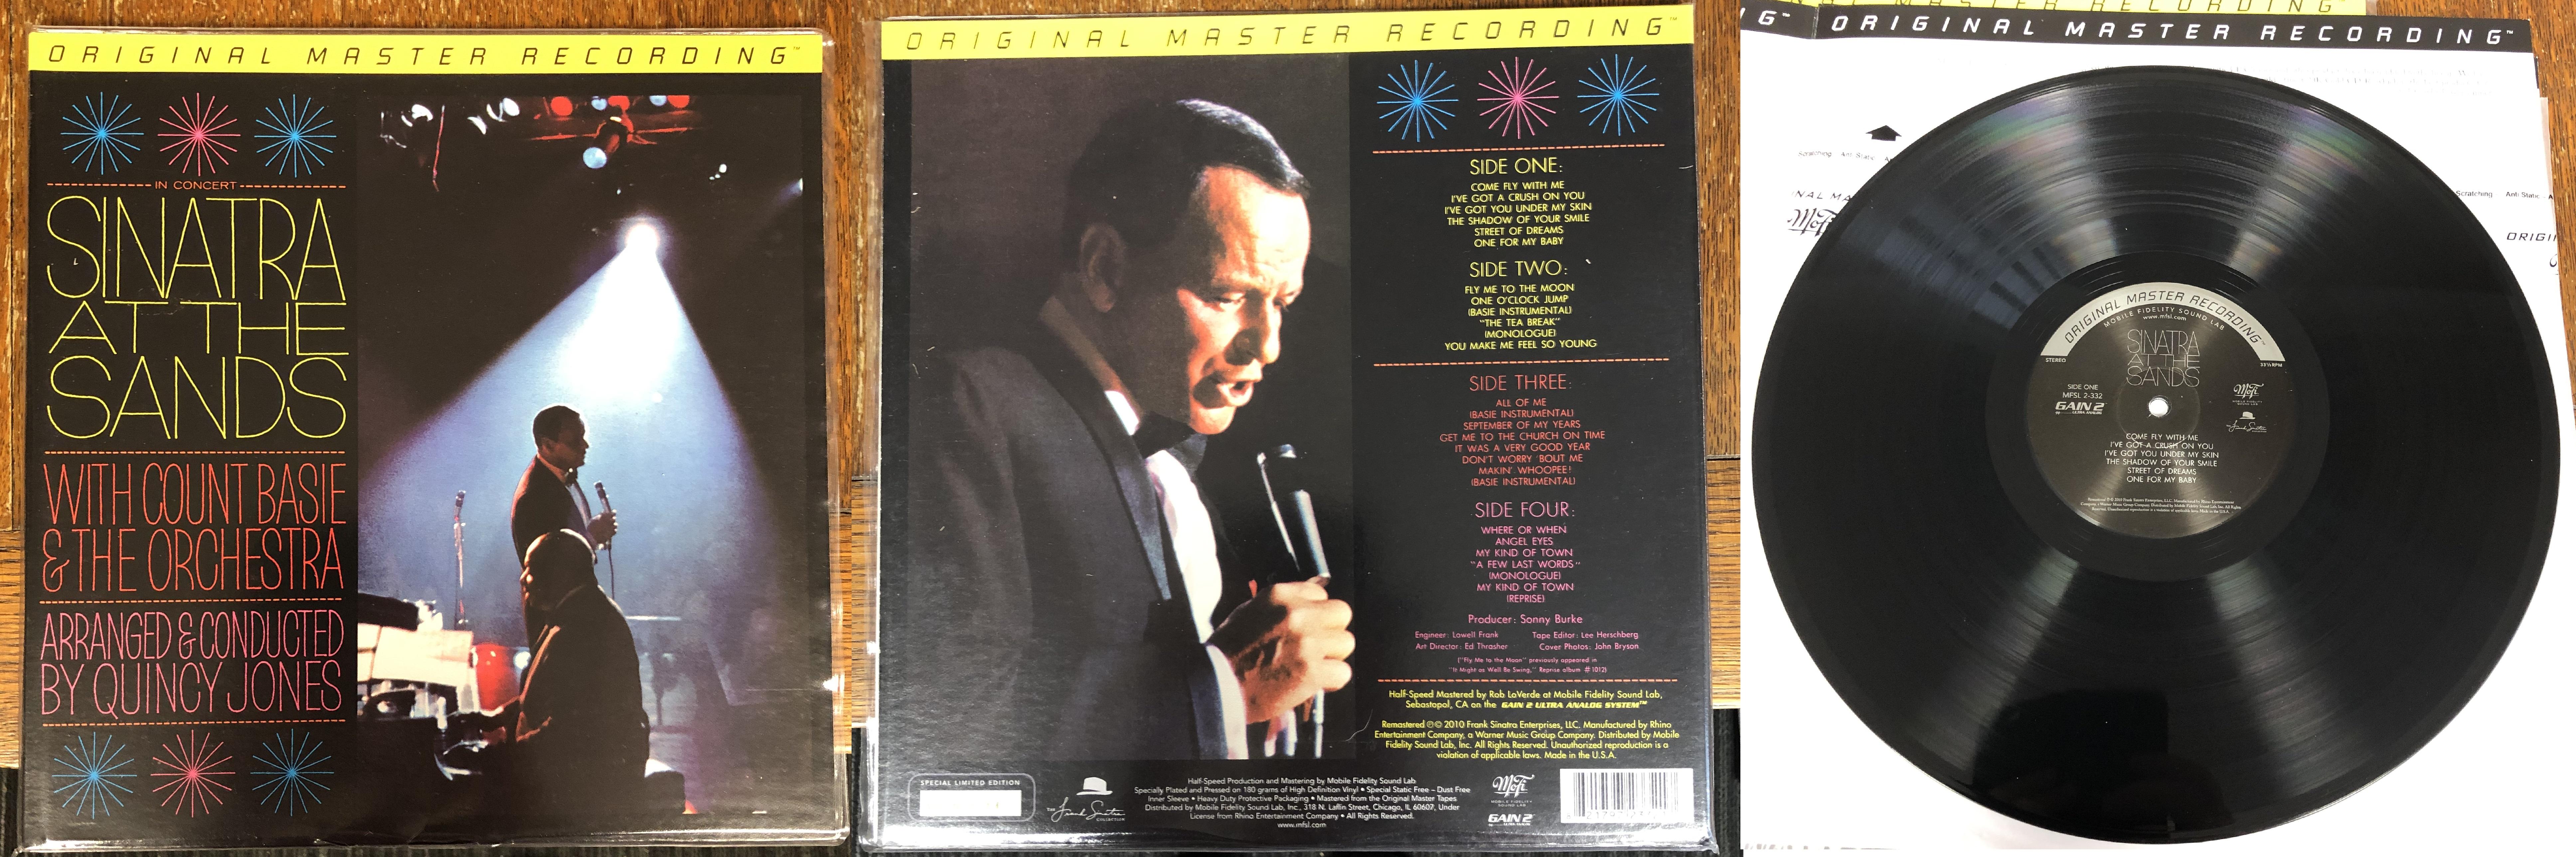 Frank Sinatra - Sinatra at the Sands